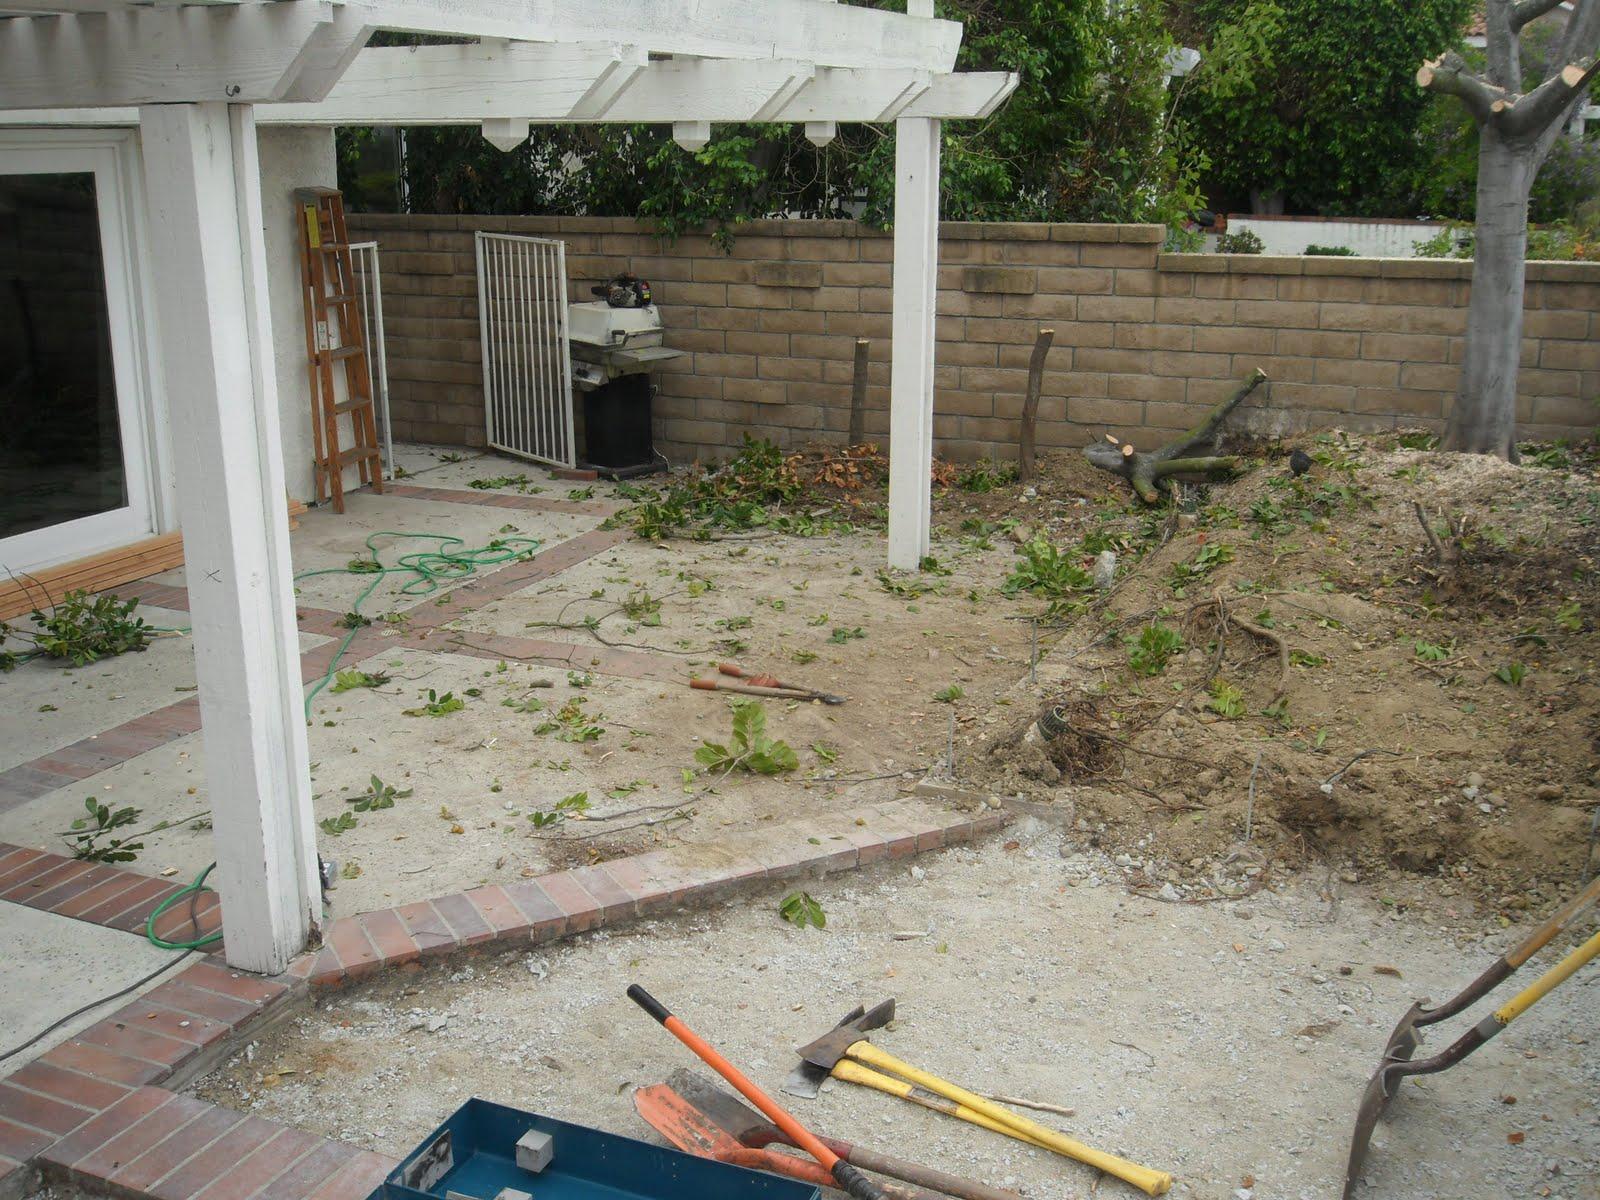 714 483 6927 Garden Grove Demolition Services